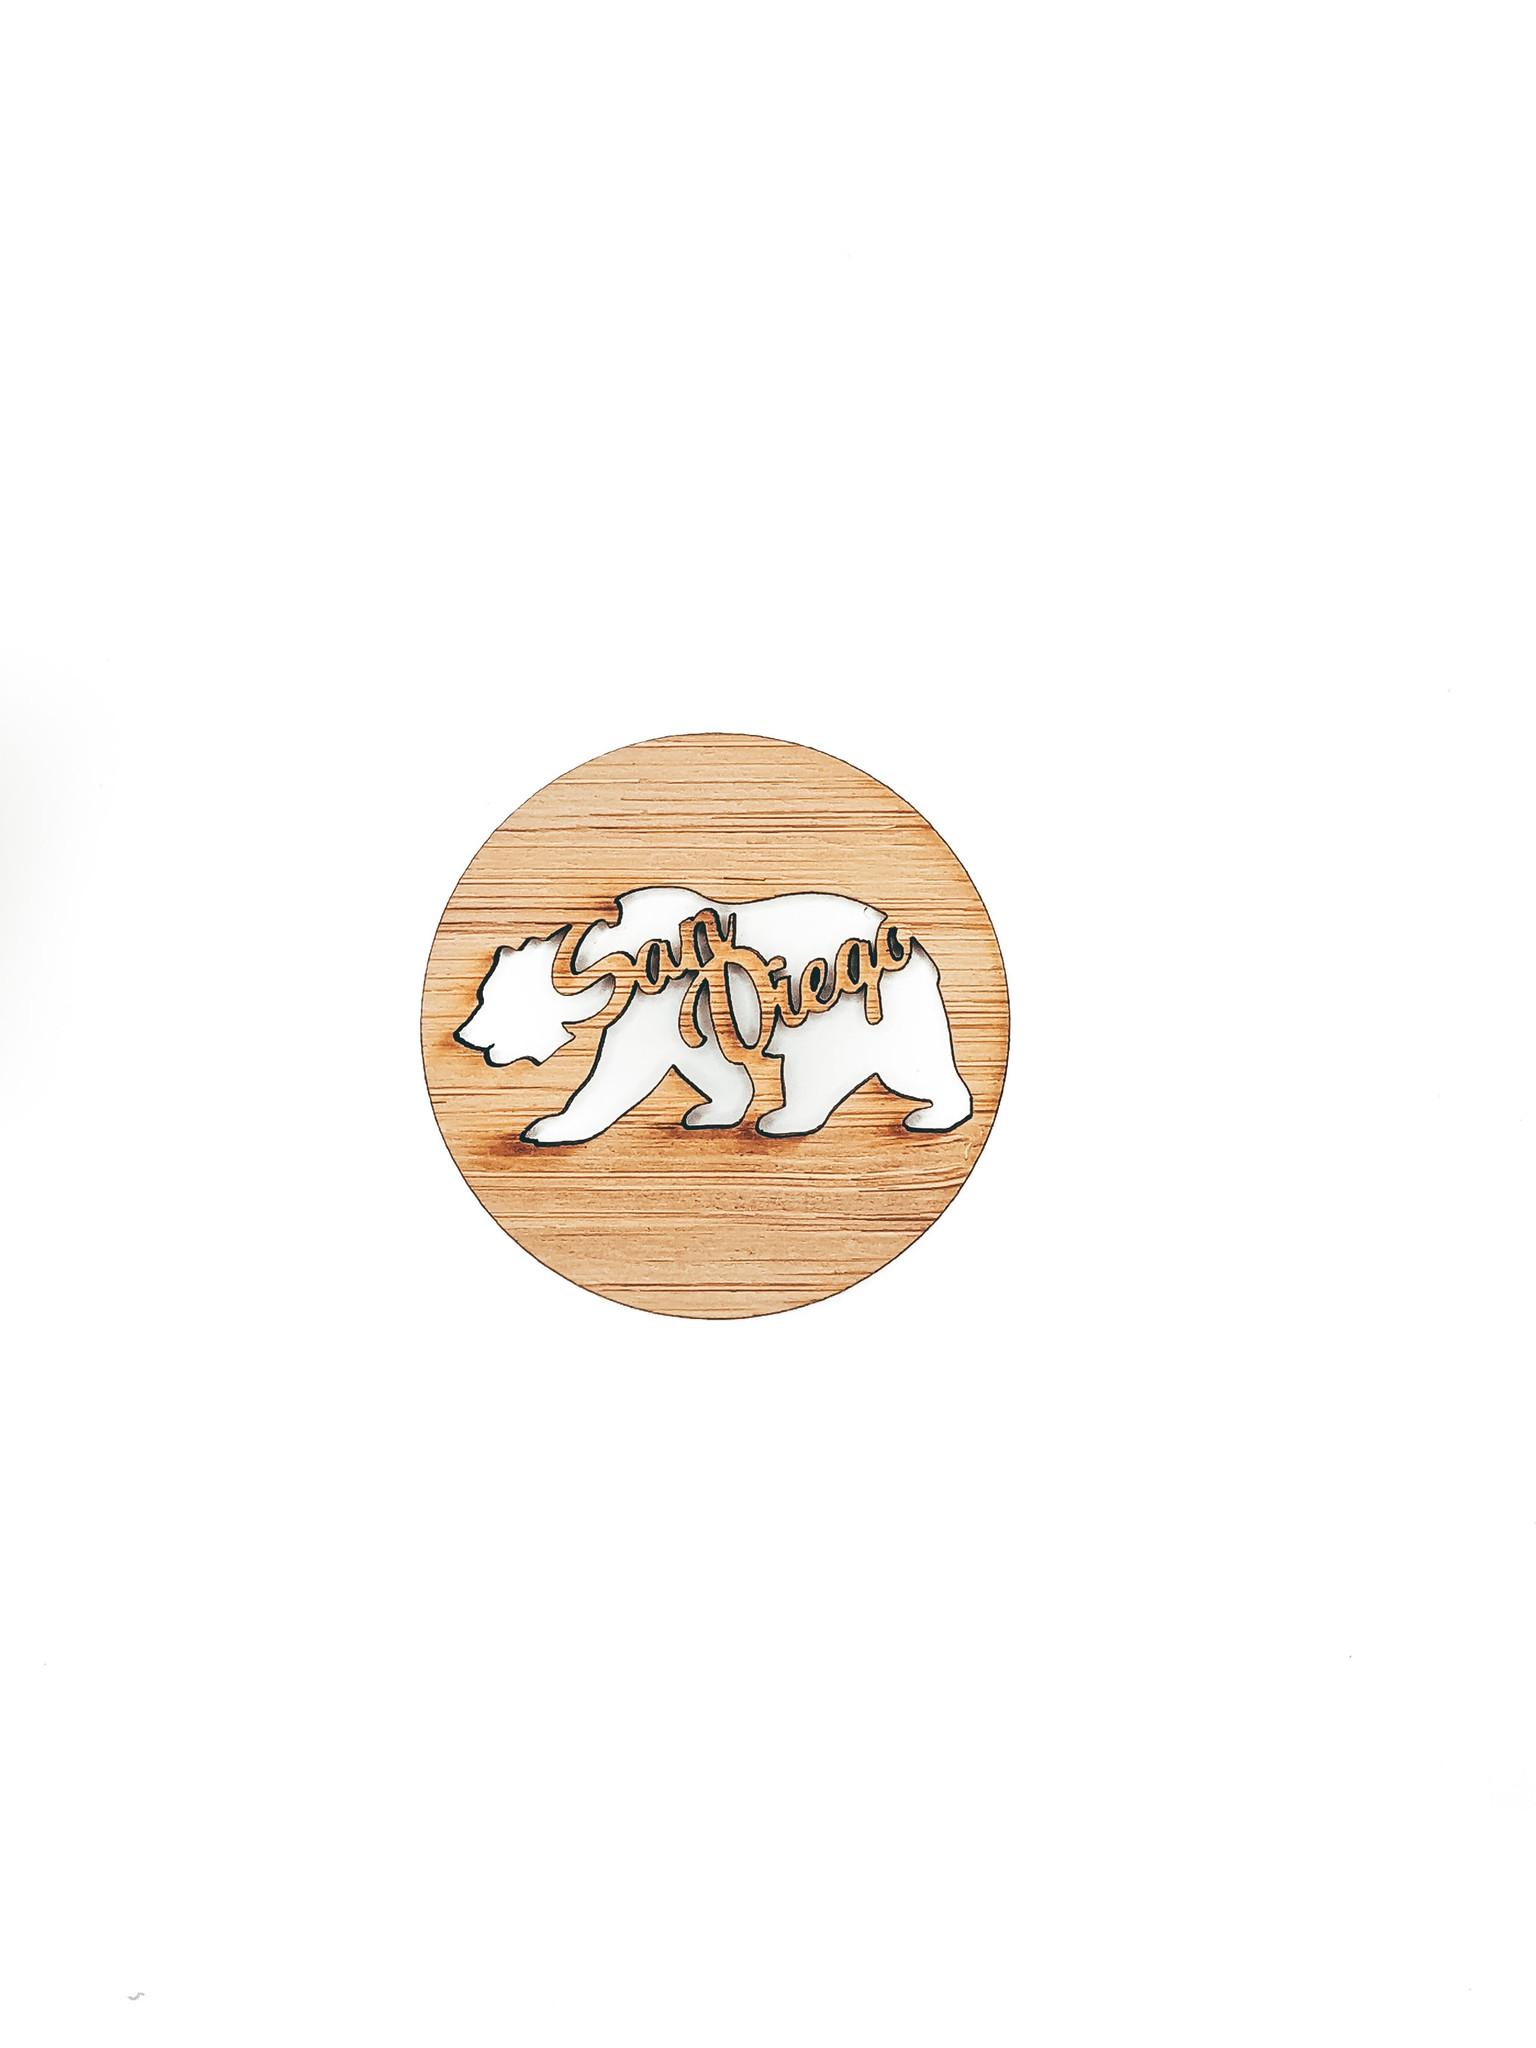 san diego california bear magnet, handmade in san diego, women owned